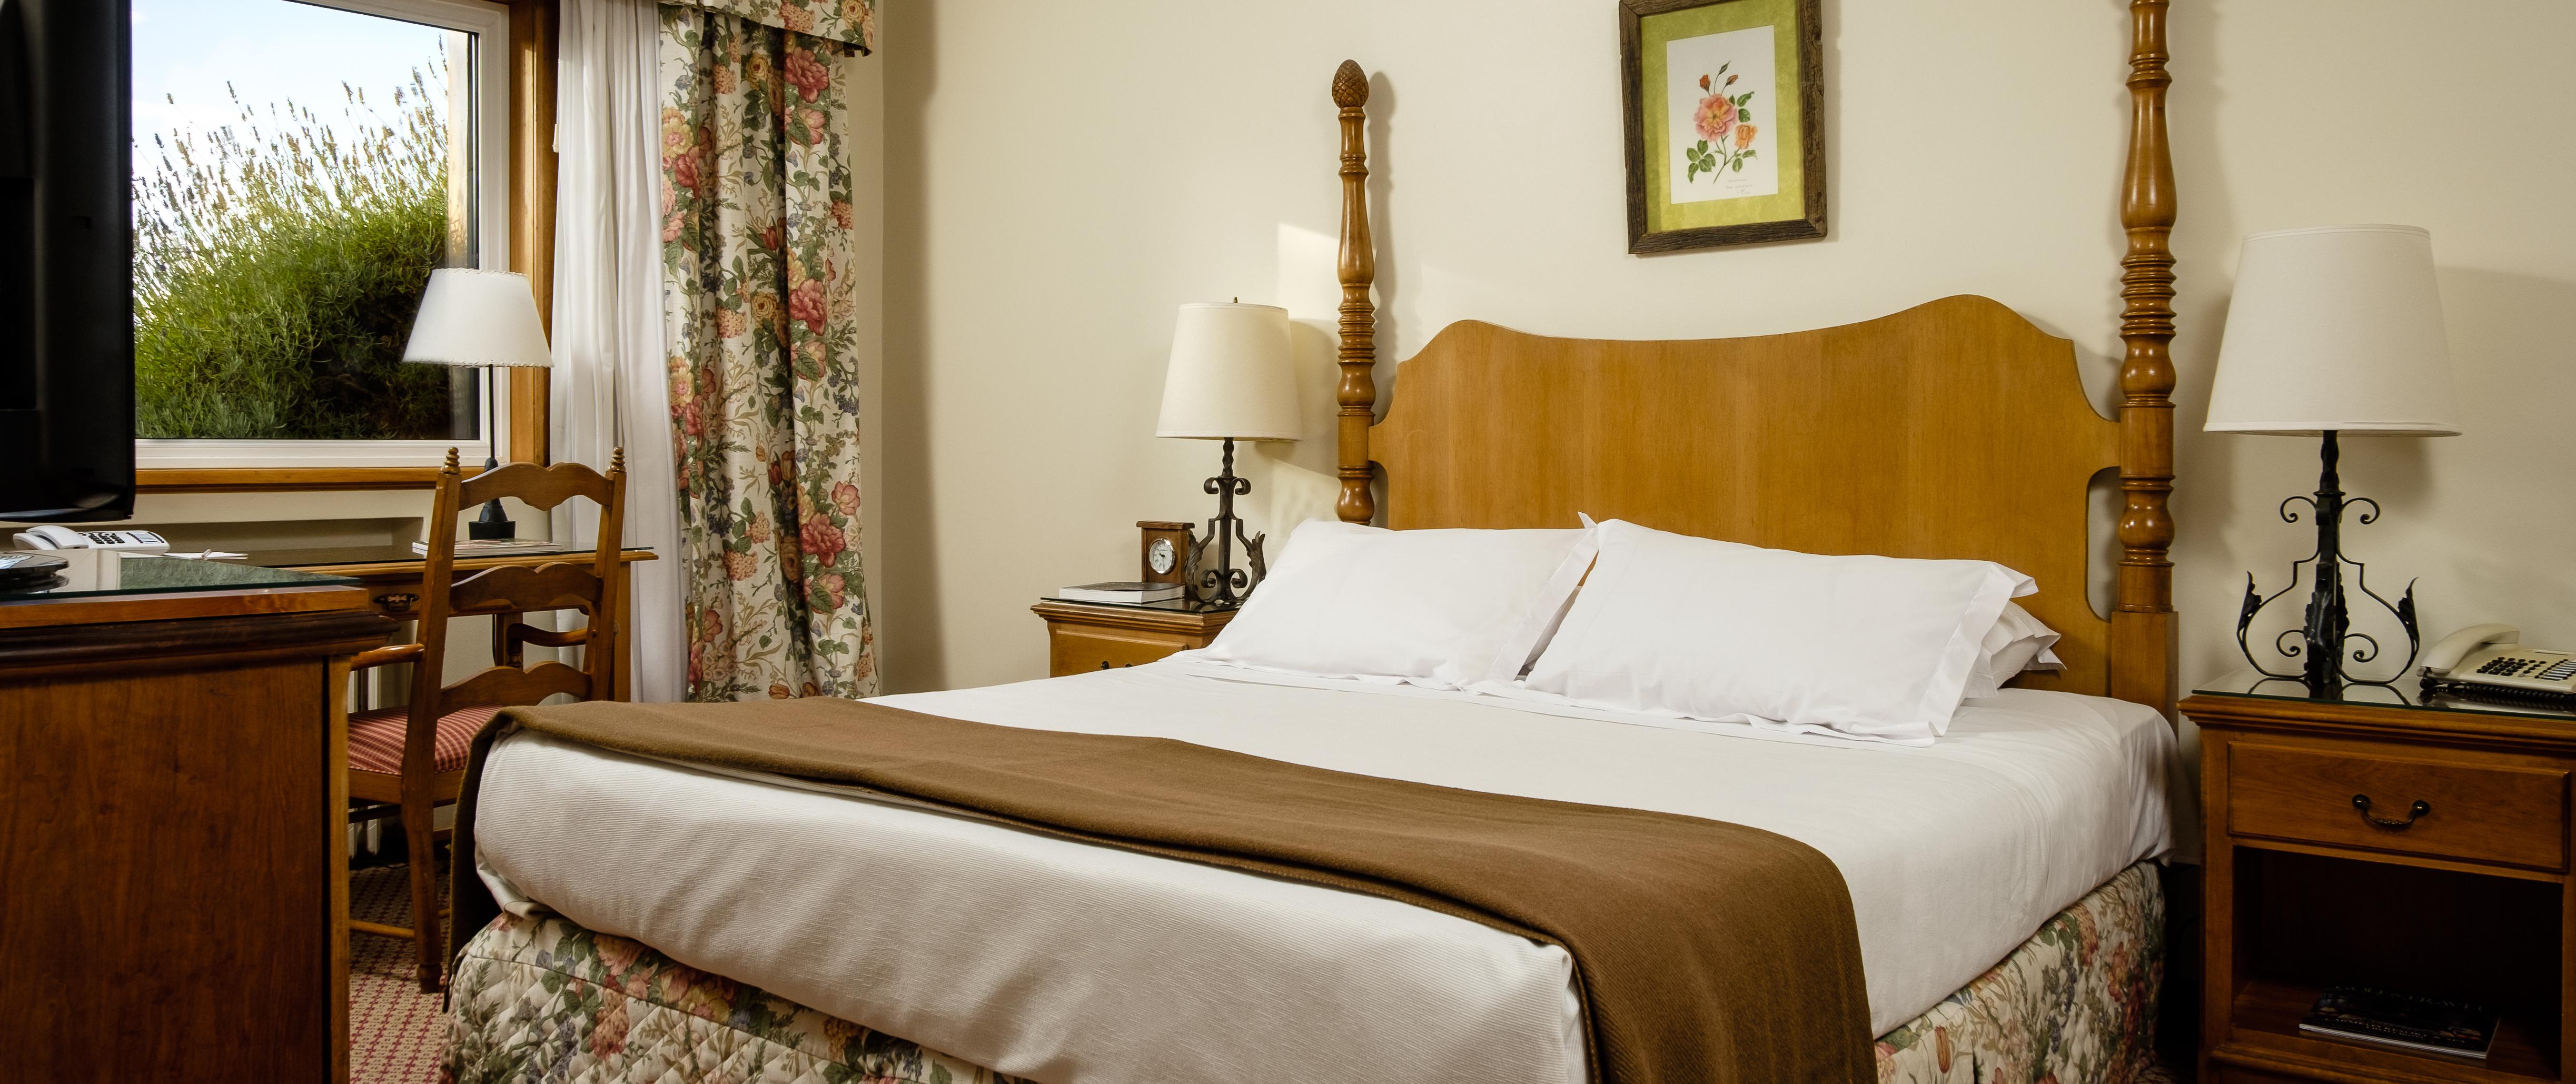 llao-llao-hotel-standard-room